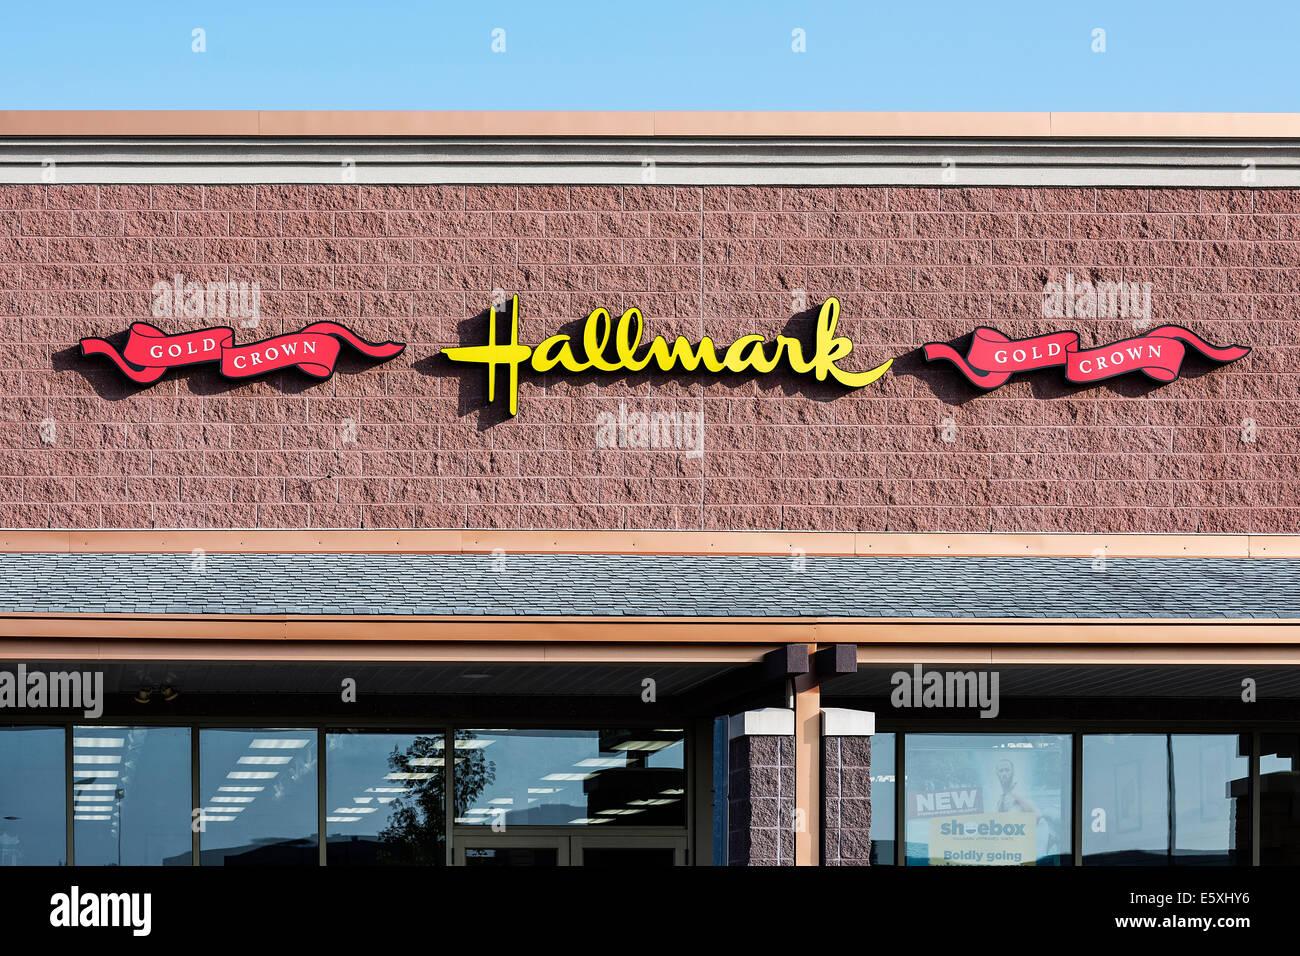 Hallmark Grußkarten-Shop, Mount Stinklorbeer, New Jersey, USA Stockbild